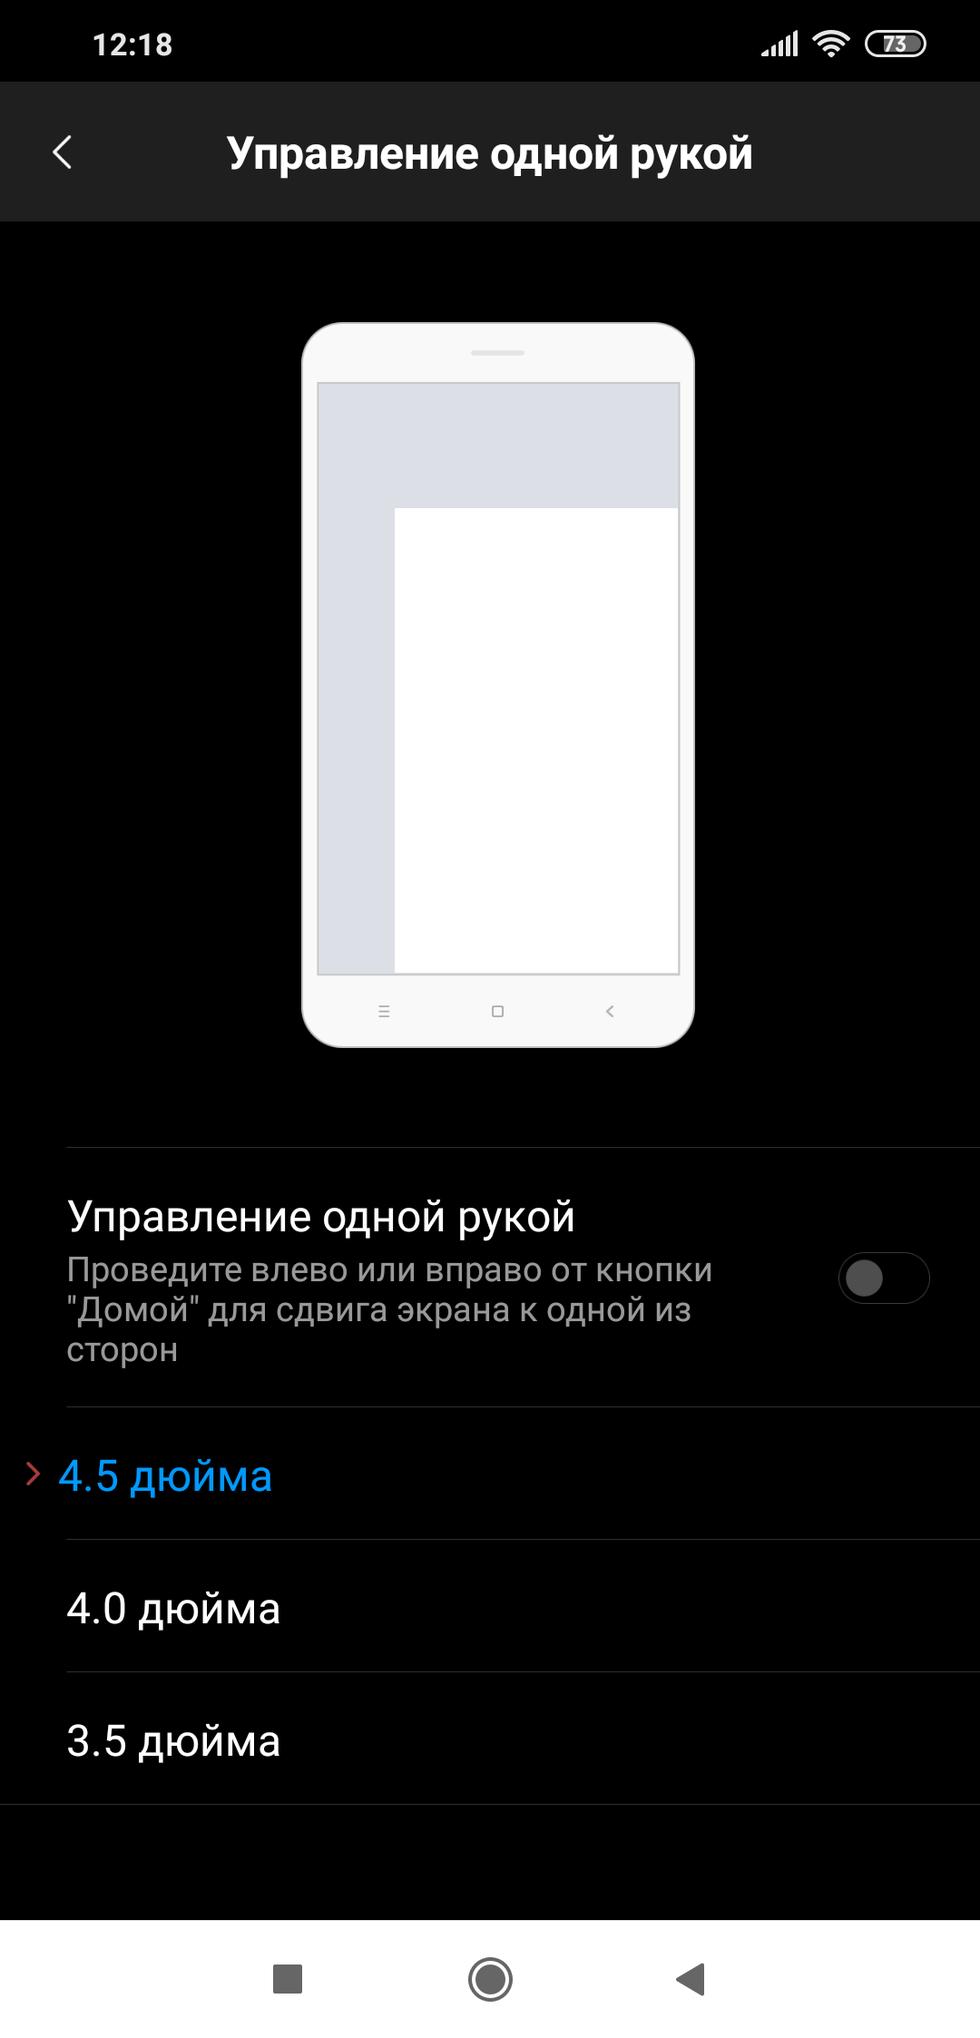 Screenshot_2019-01-12-12-18-42-821_com.android.settings.png